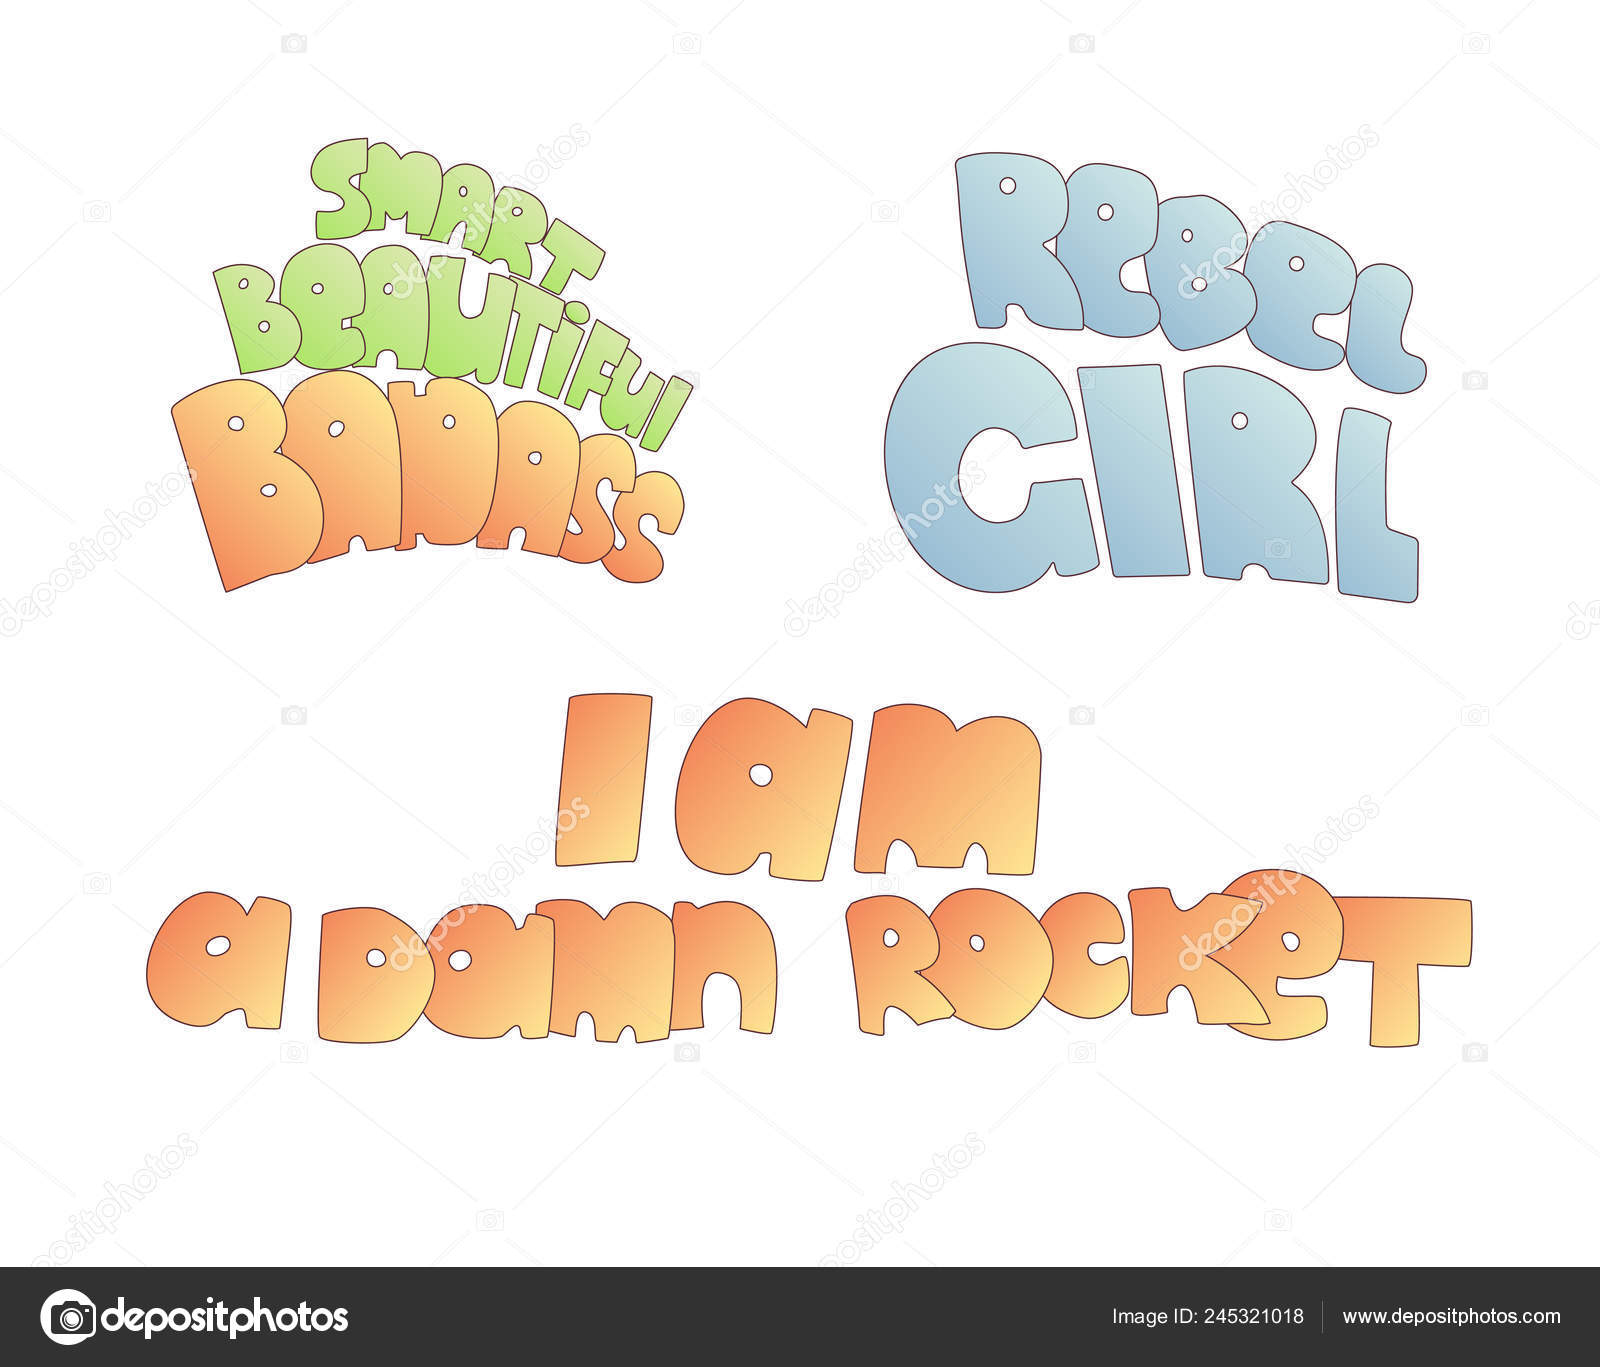 Bonito Dos Desenhos Animados Feminista Rebelde Garota E